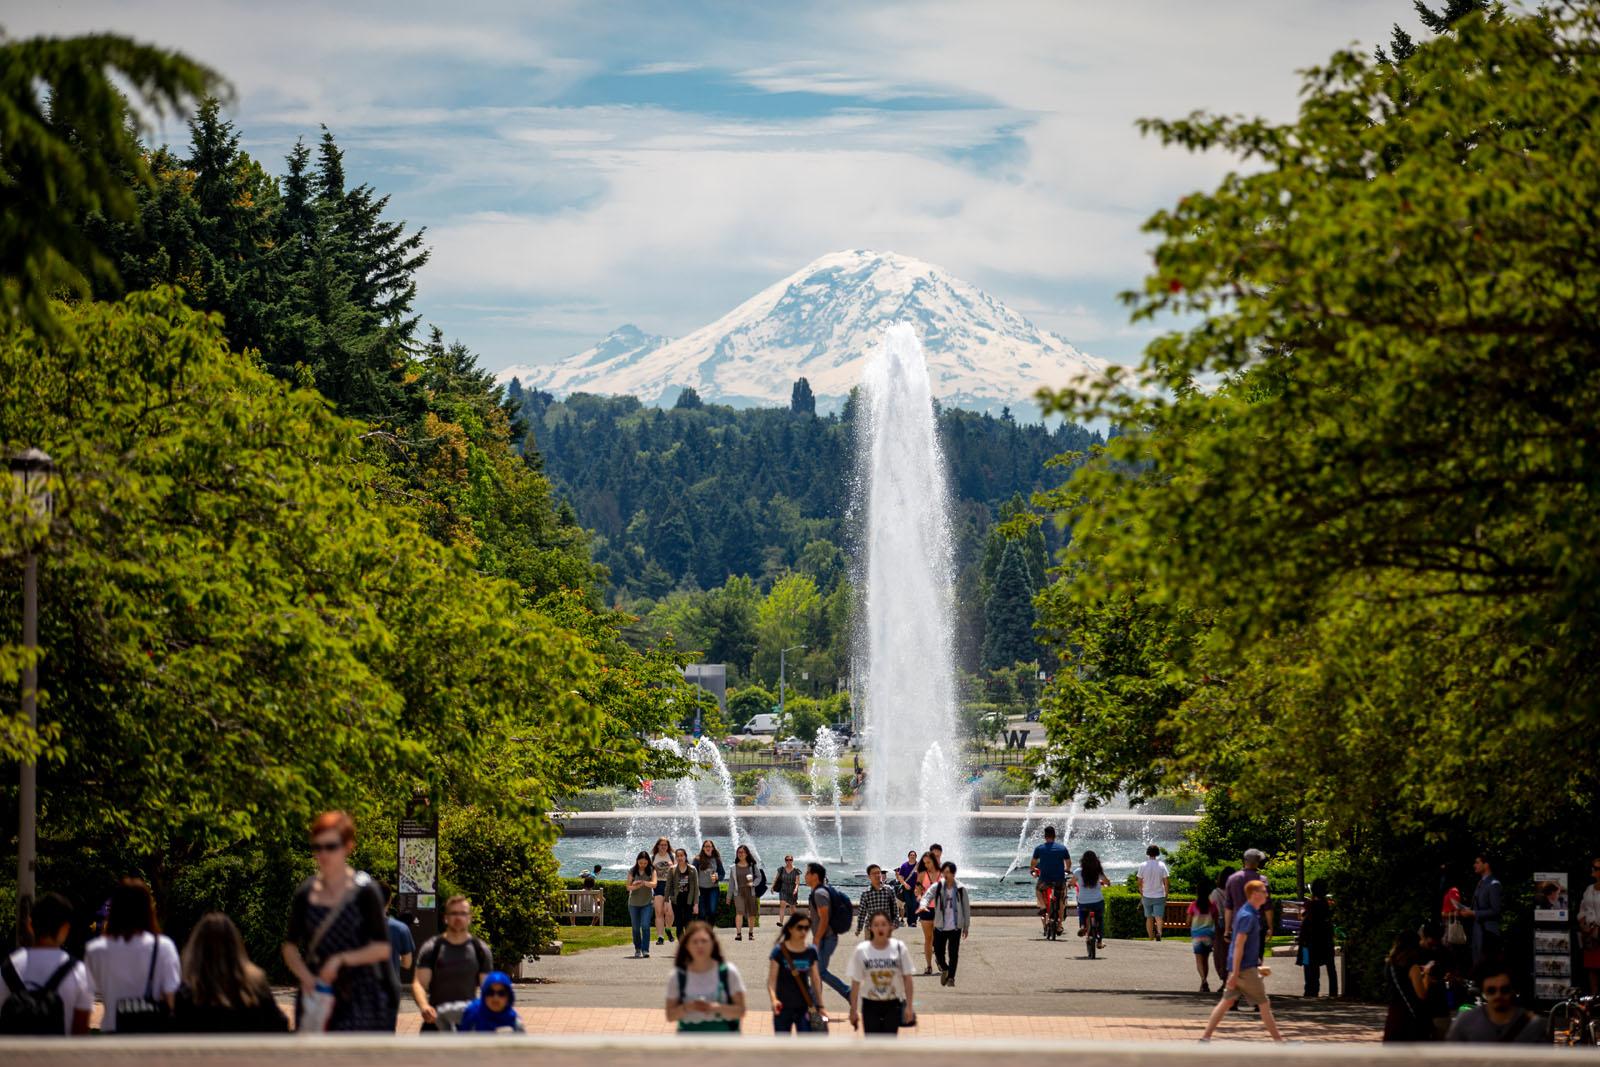 UW Campus on Graduation Day in June,